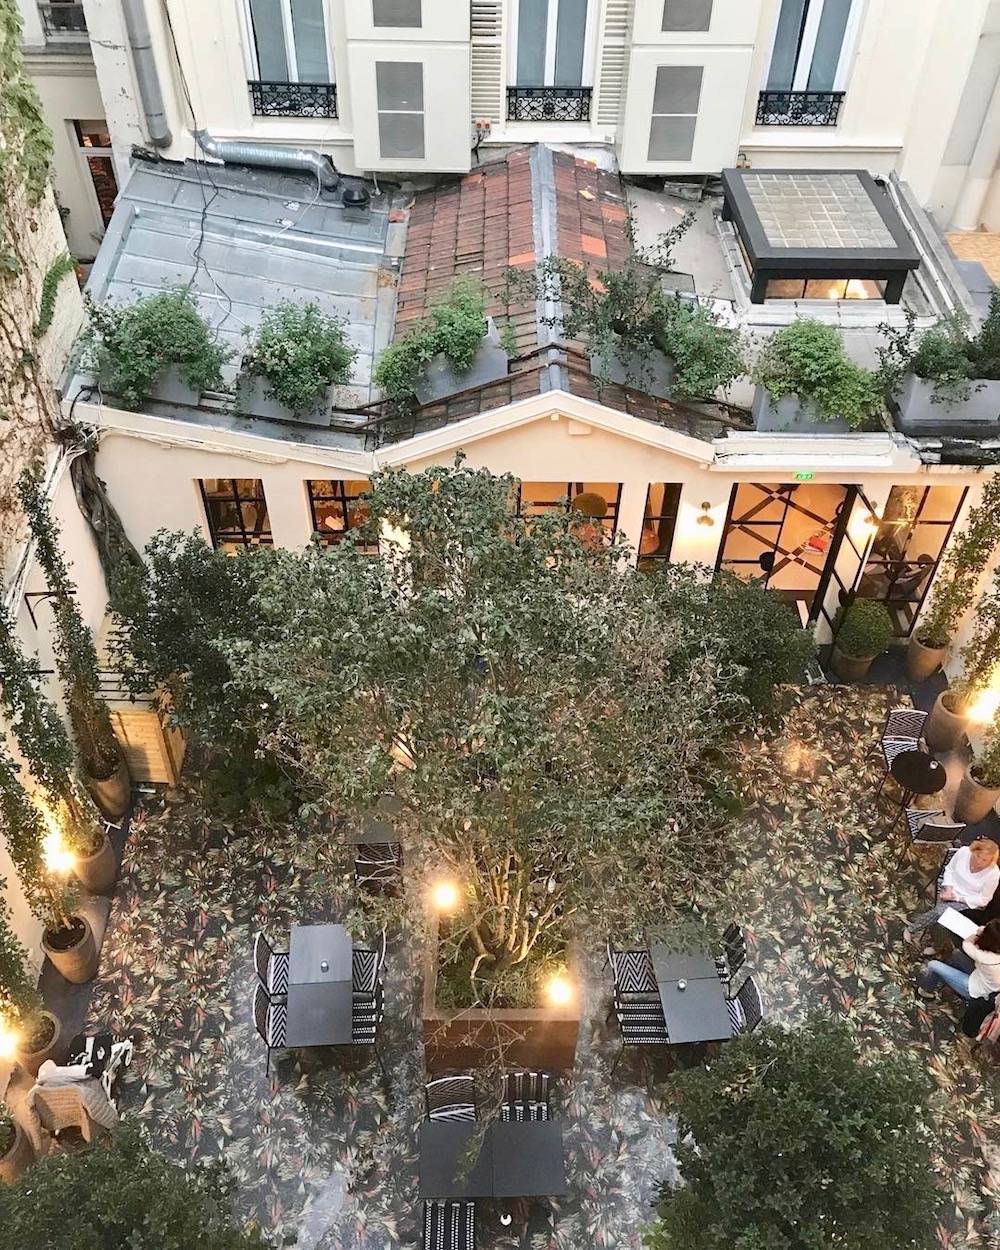 hôtel bienvenue staycation jardin intérieur